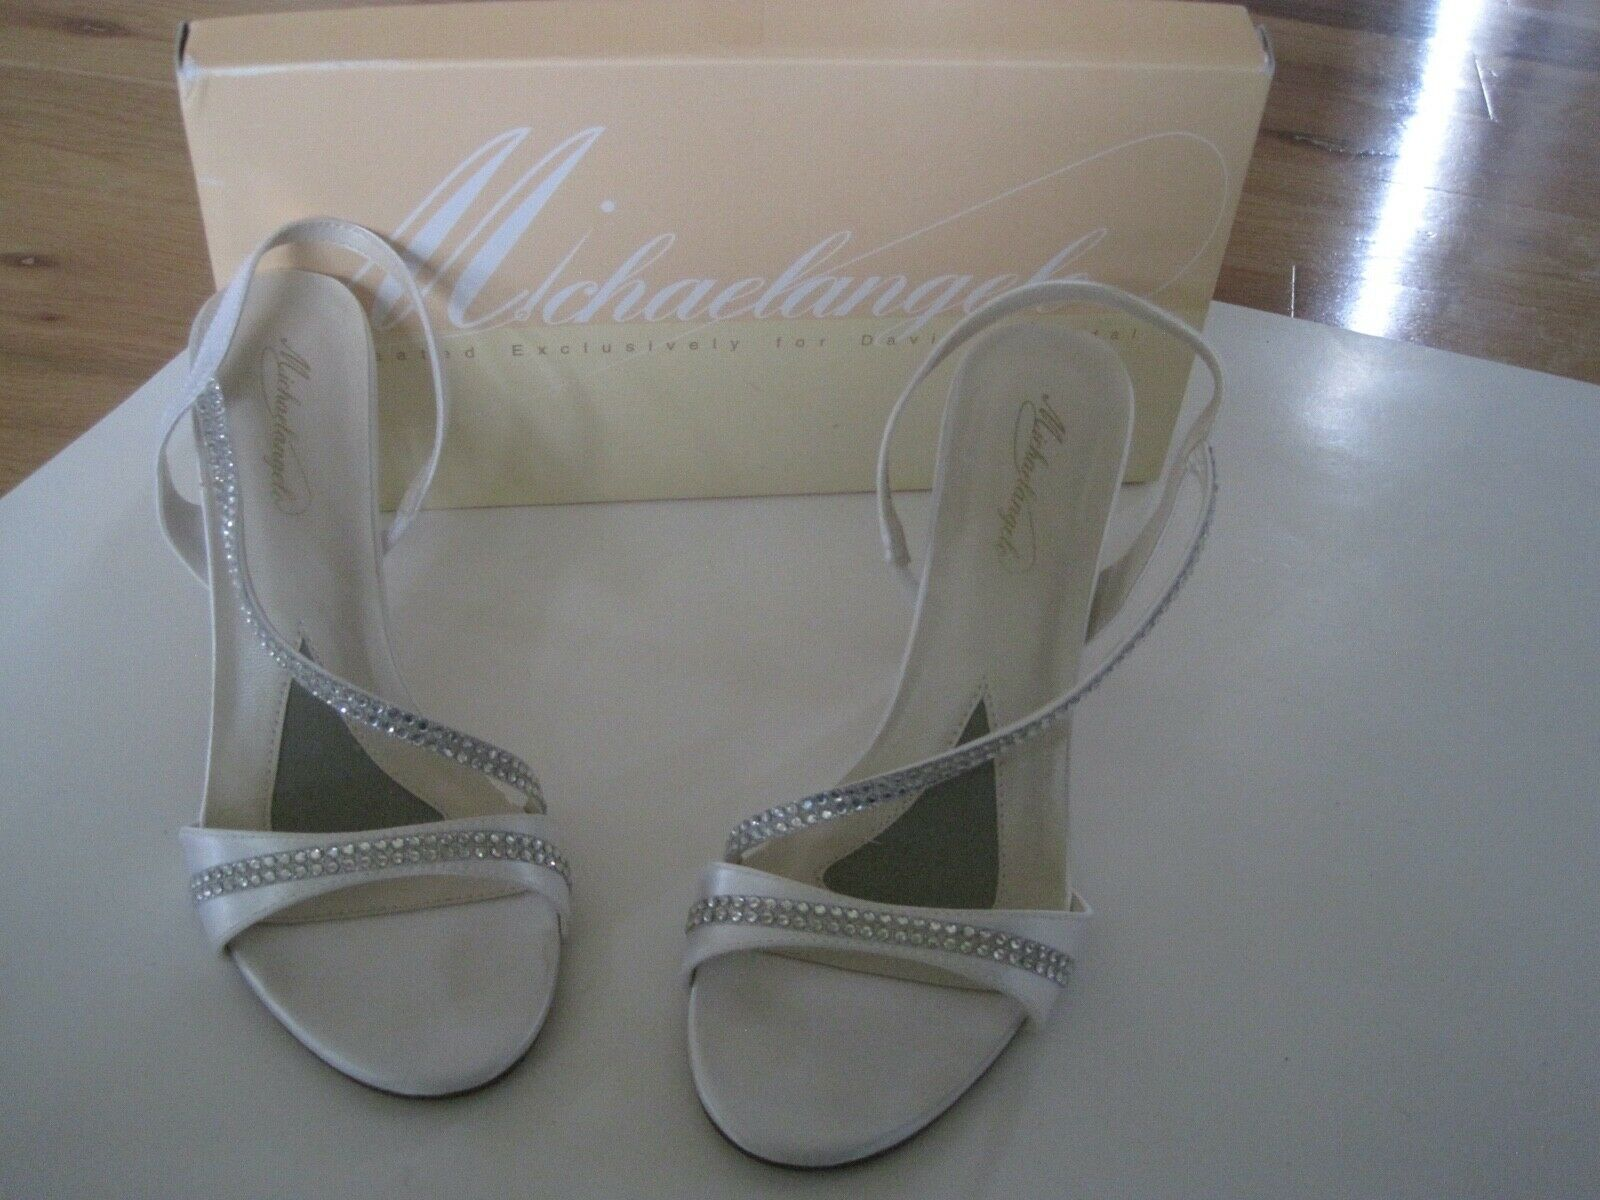 Bride Shoes Michaelangelo YVETTE David Bridal Rhinestone Satin Size 8.5 w/ Box